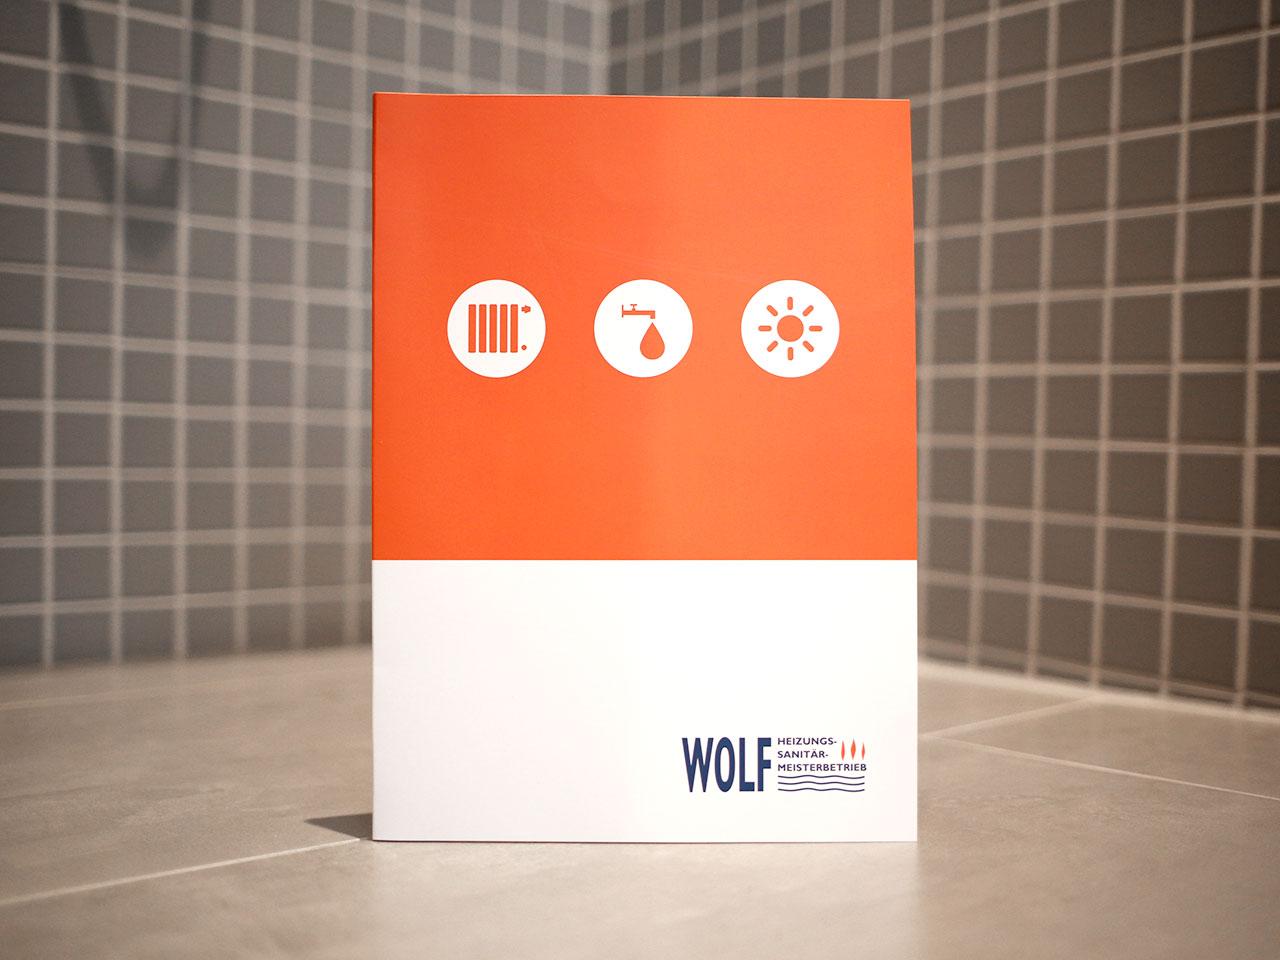 Wolf - Heizung / Sanitär